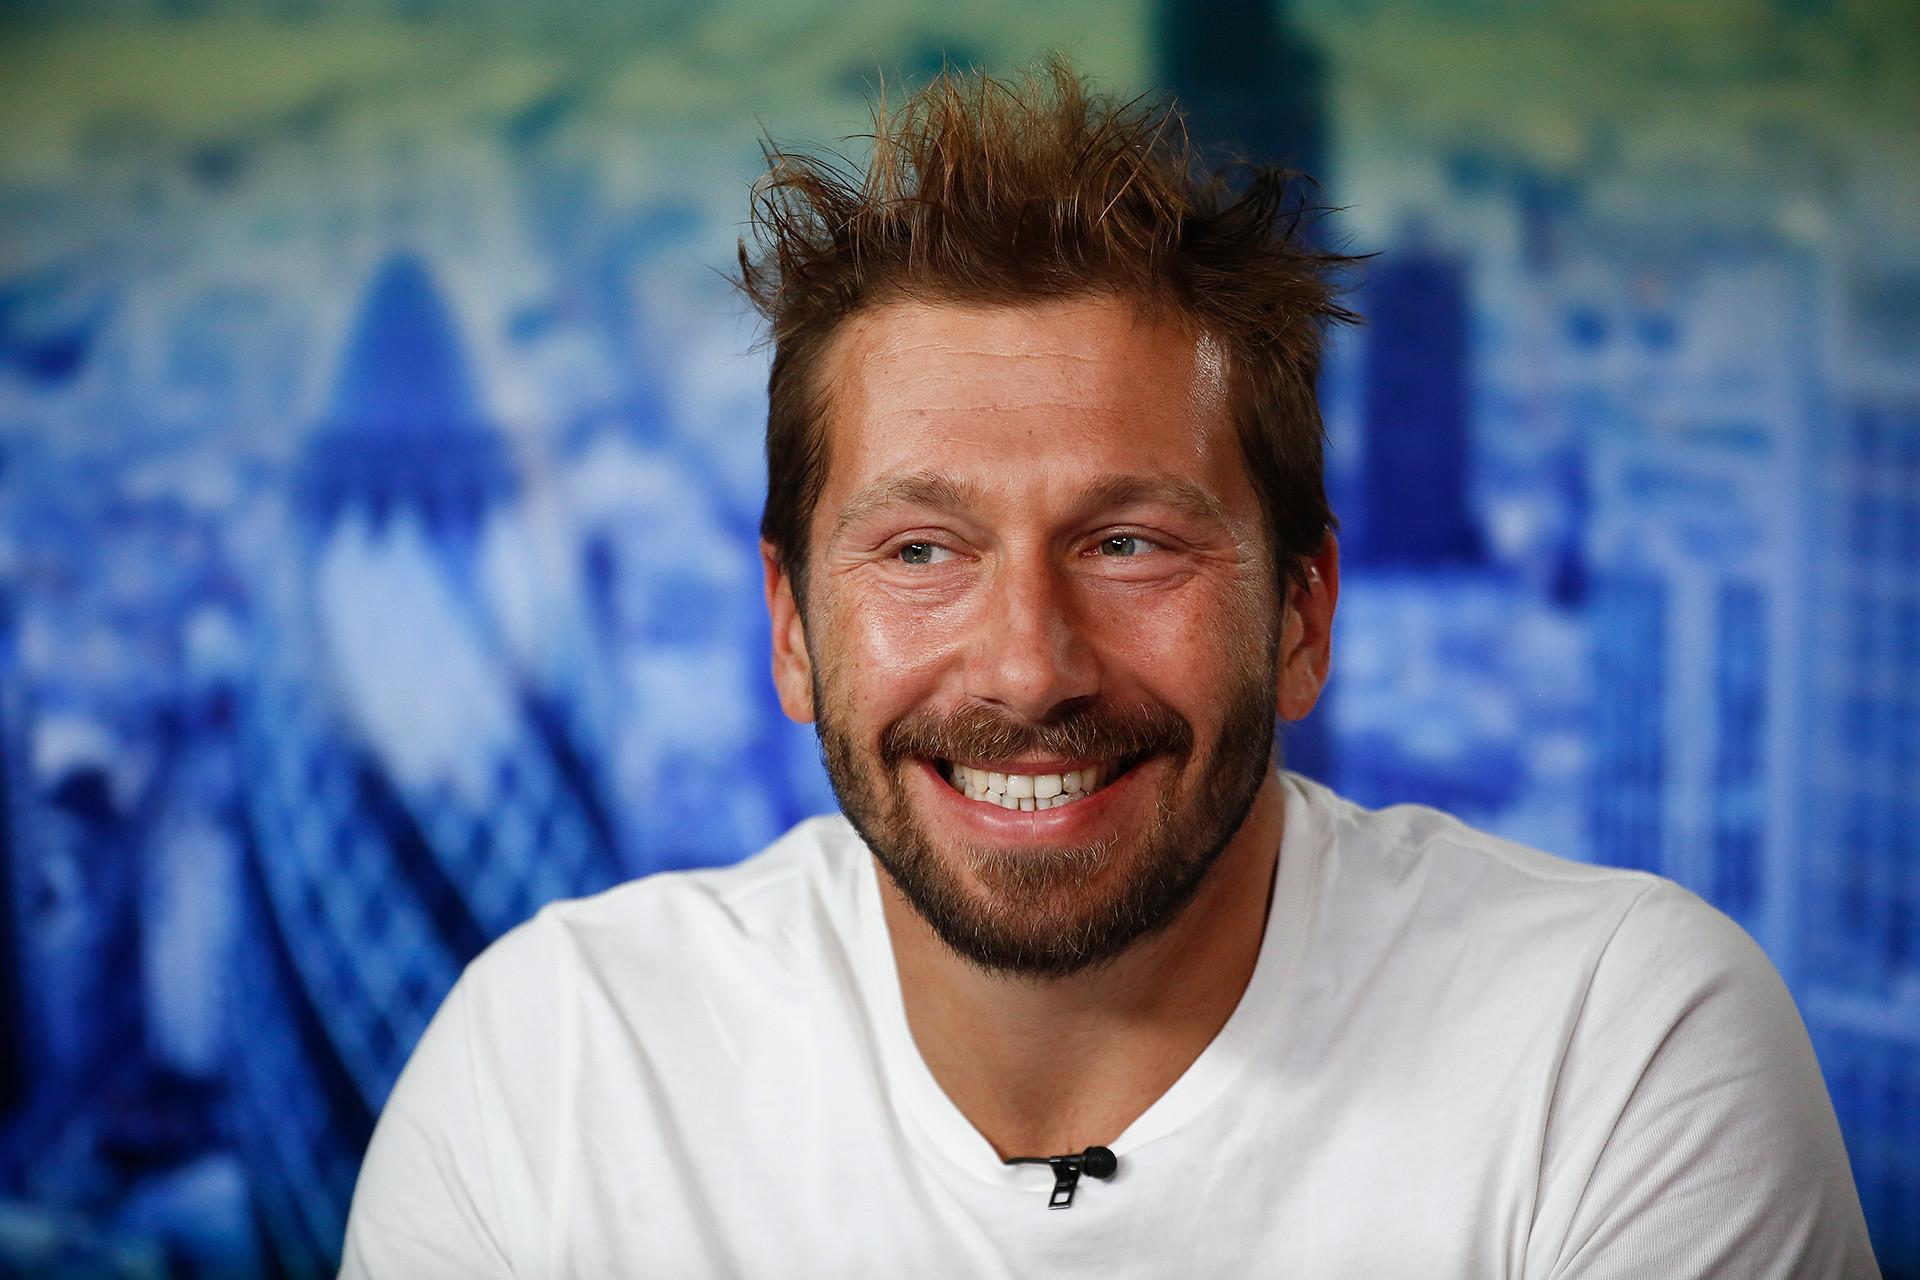 Tchitchvarkin em entrevista a rede de TV britânica